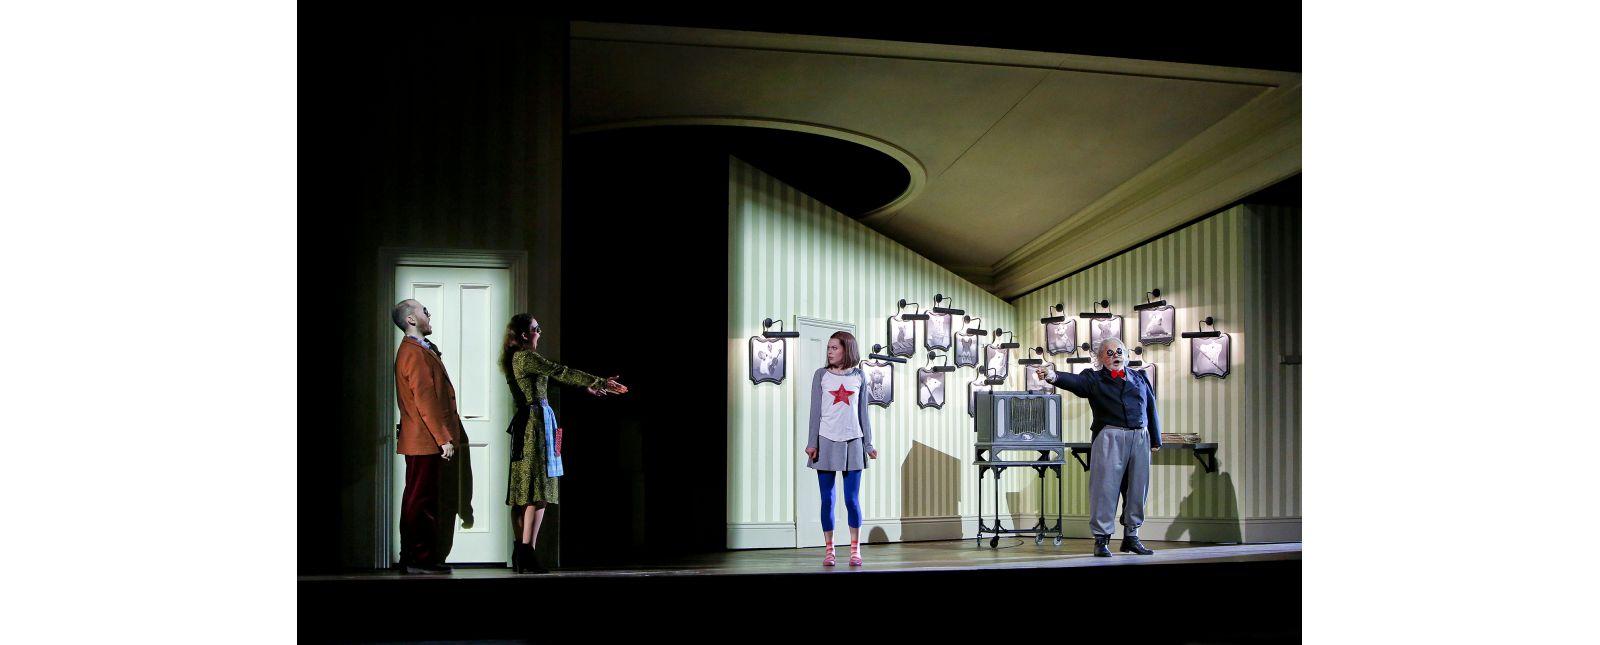 Coraline // John Carpenter // Inga Schäfer // Samantha Gaul // Roberto Gionfriddo // 2018 // Birgit Hupfeld